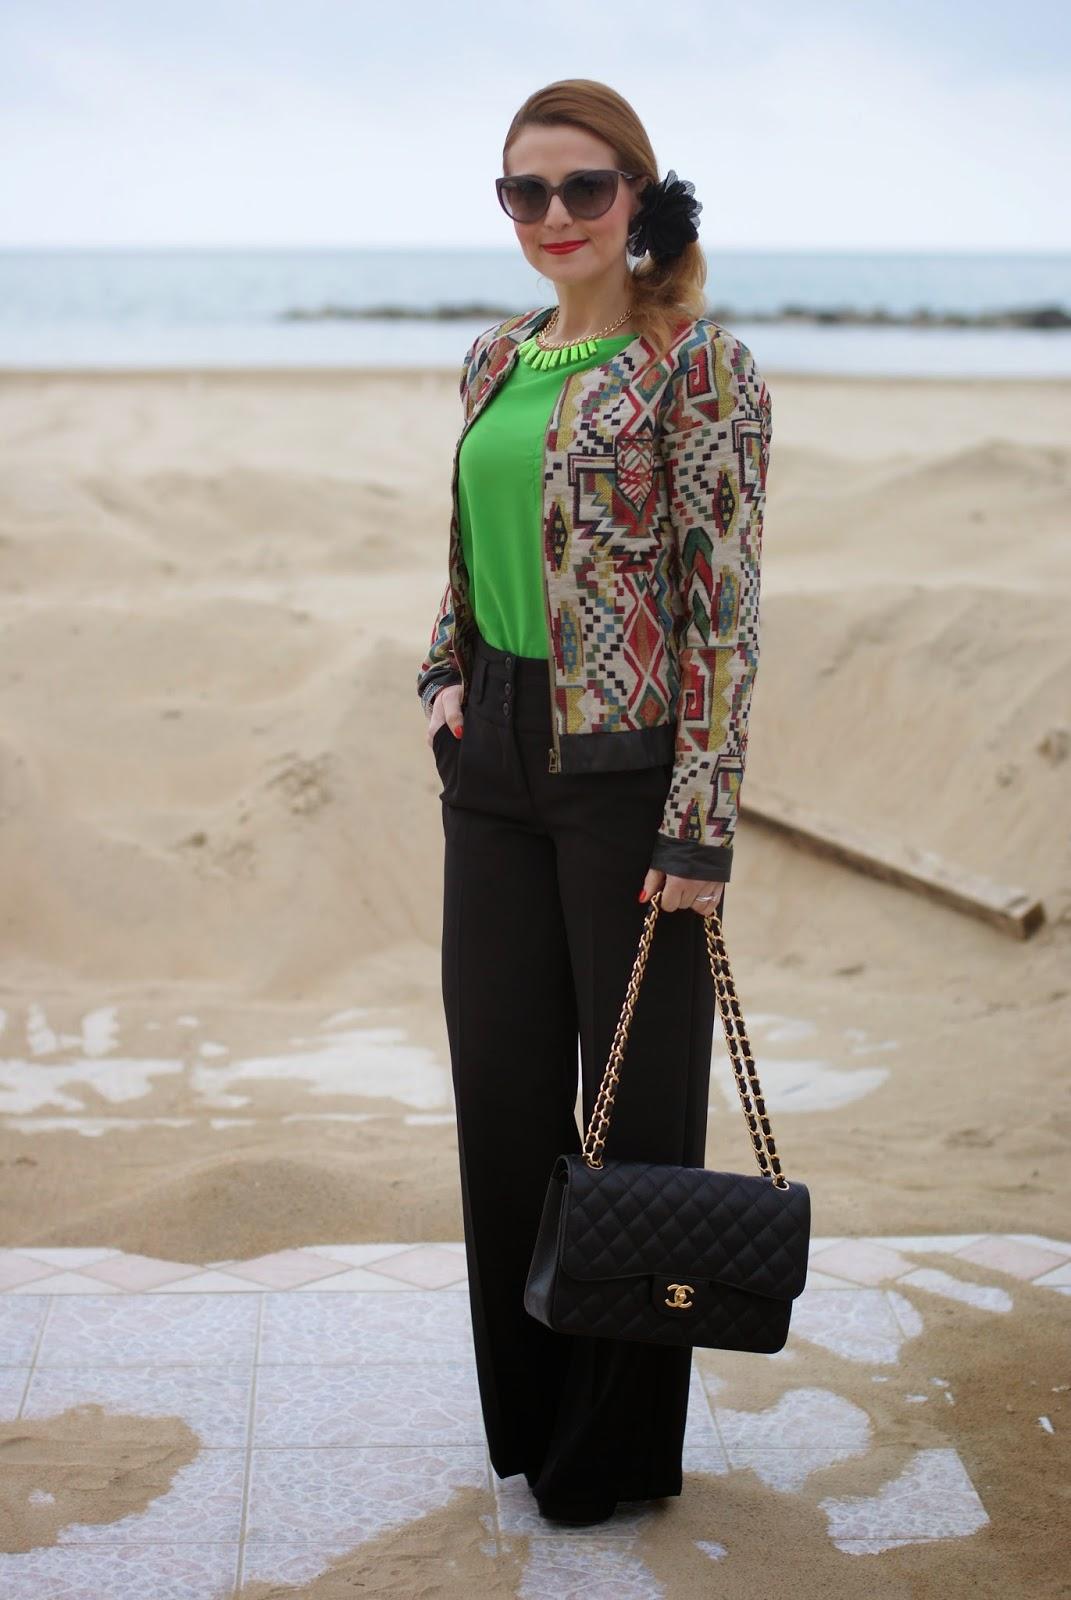 Chanel 2.55 classic flap bag, palazzo trousers, Paramita jacket, bomber jacket, Moliabal elastico capelli, palazzo pants, Lunatic pantaloni, sided ponytail, Fashion and Cookies fashion blog, fashion blogger